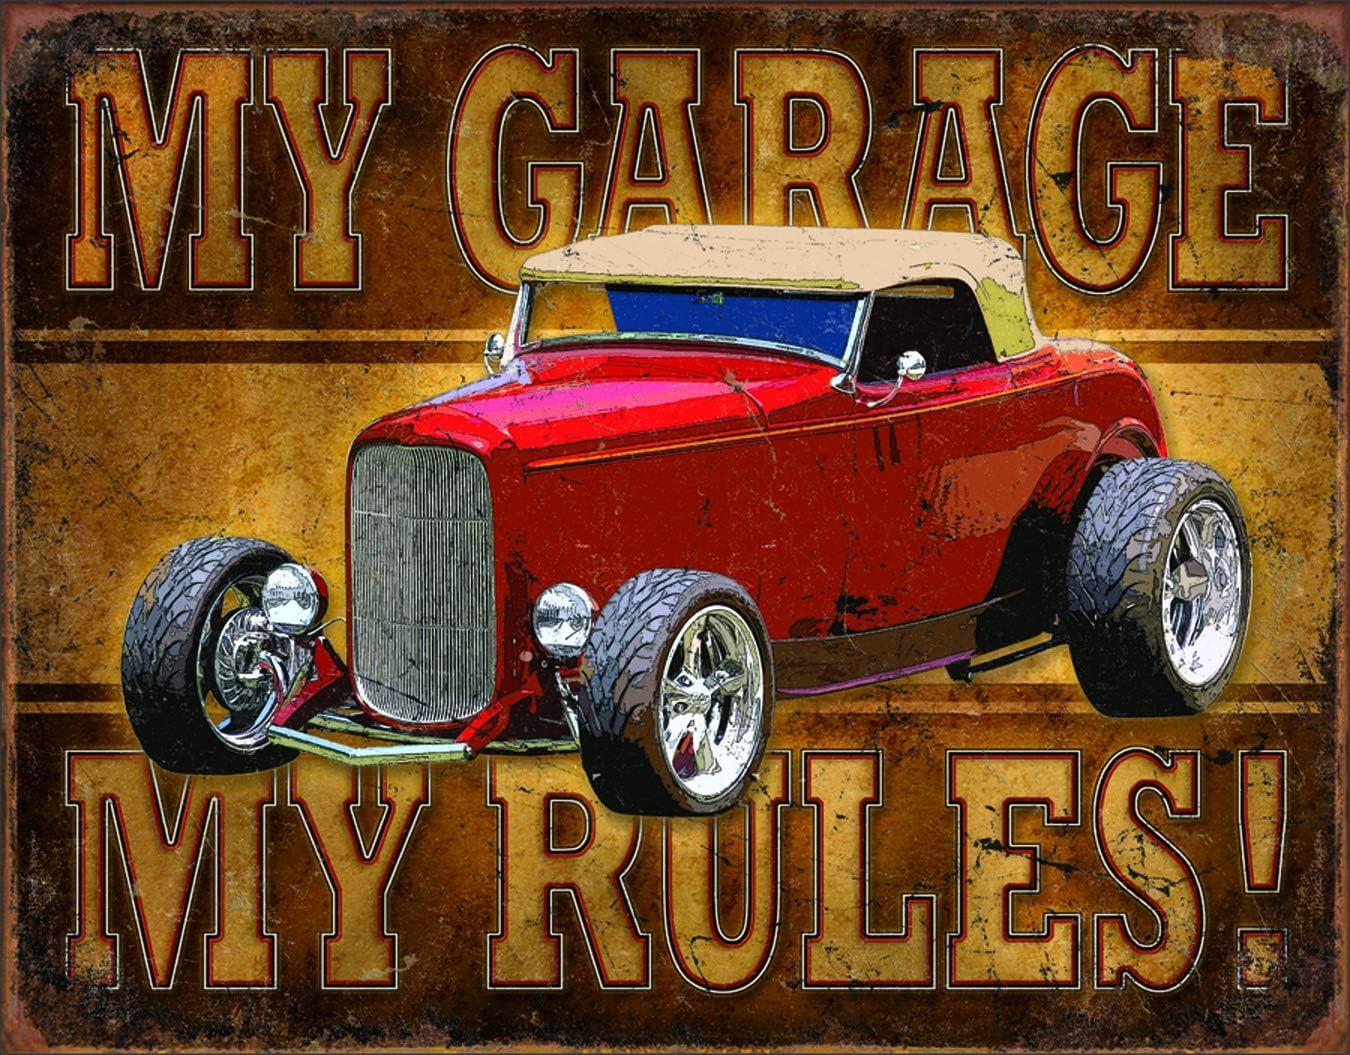 Desperate Enterprises My Garage Popularity Rules Tin 12.5